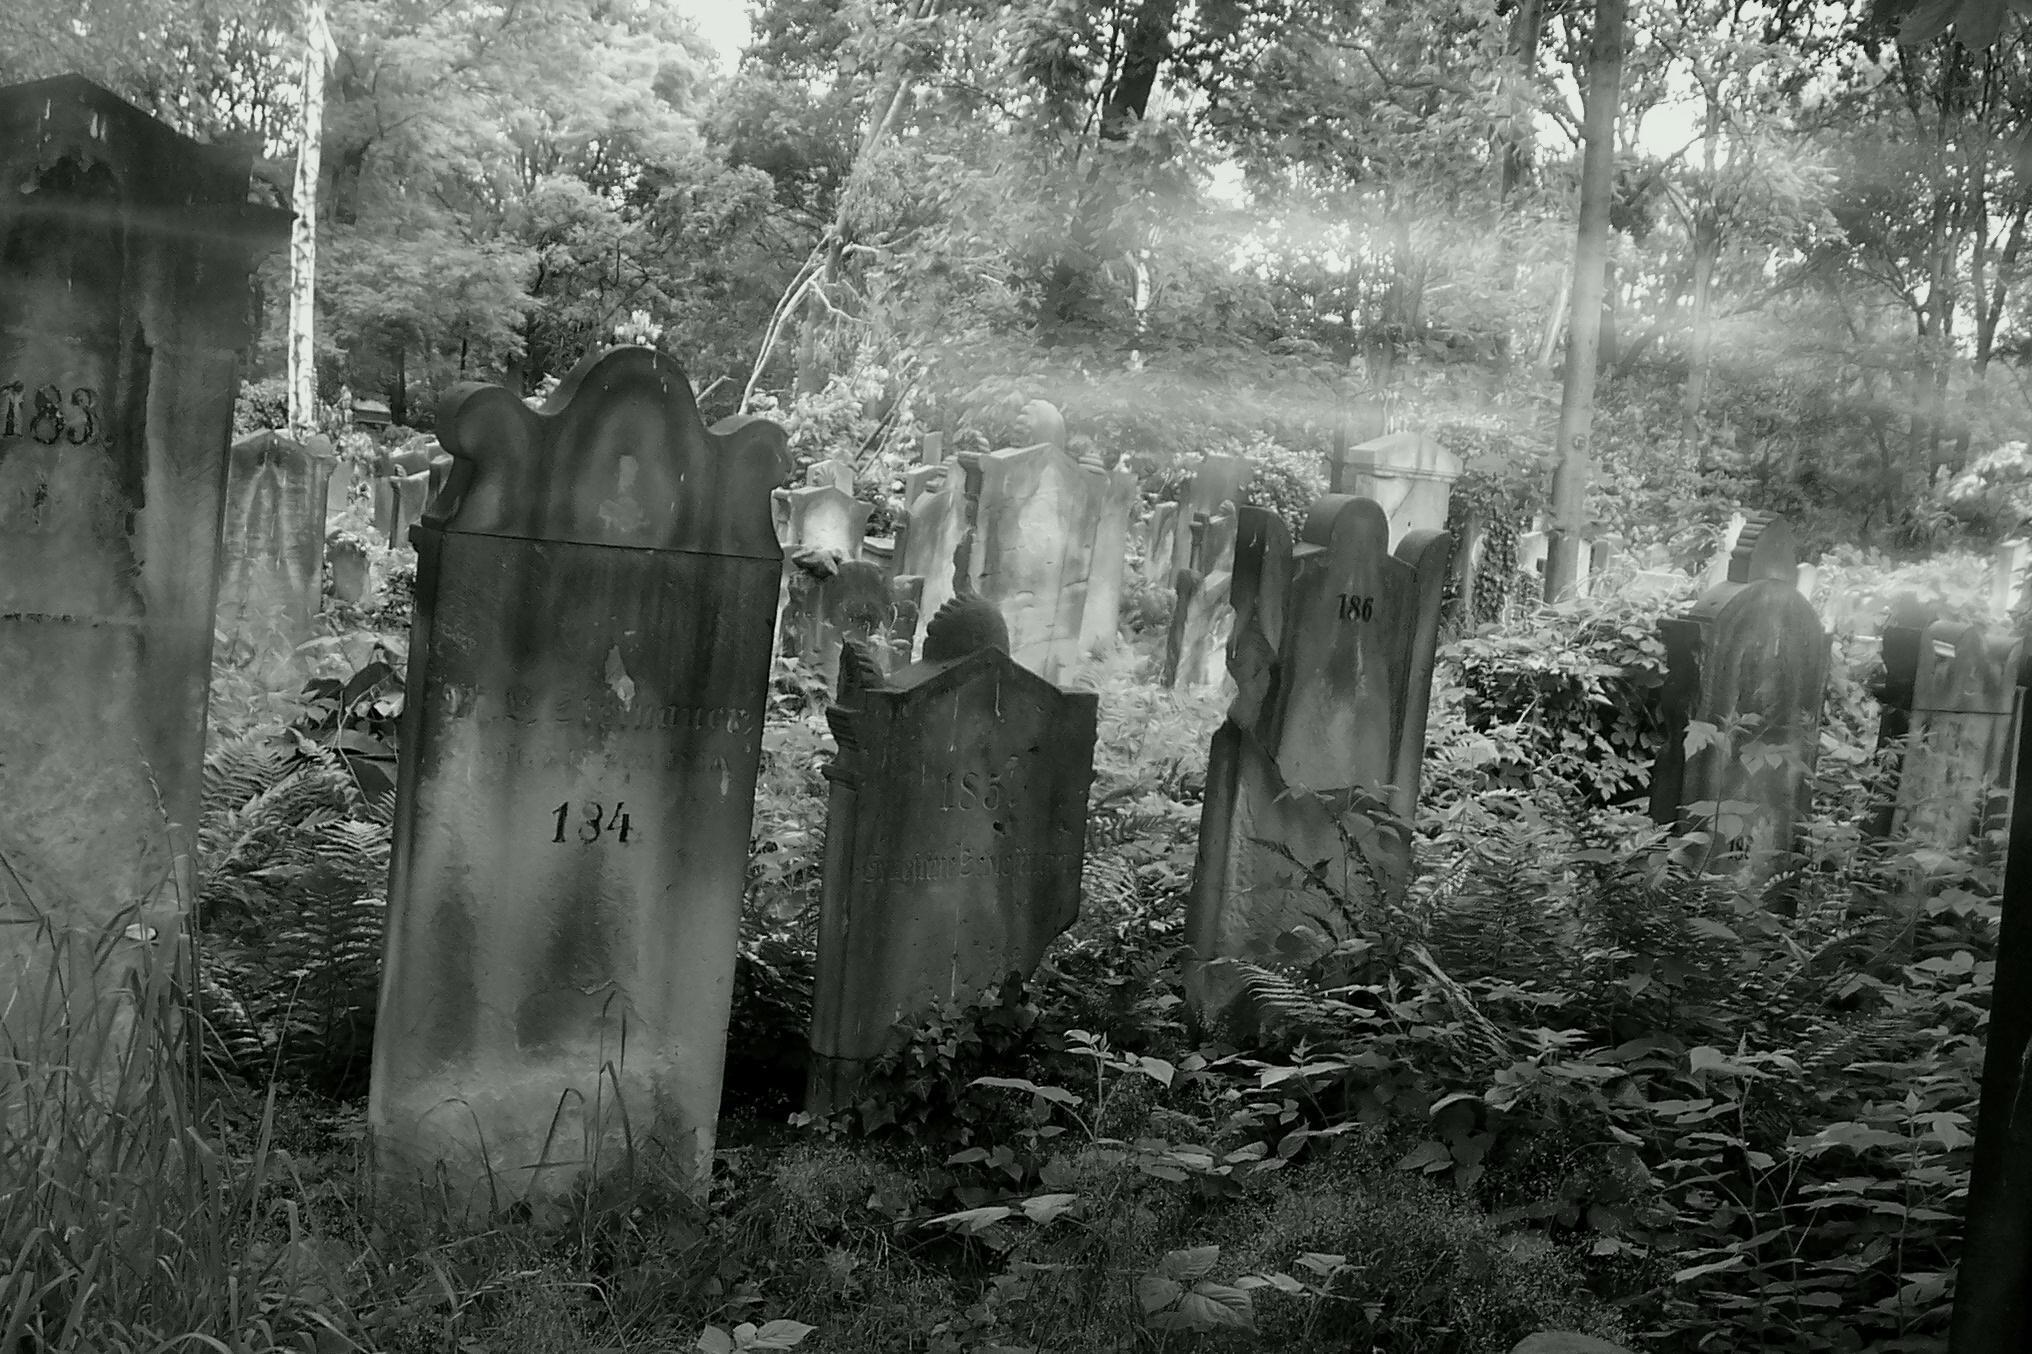 http://fc00.deviantart.net/fs8/i/2005/276/5/5/cemetery_by_Agnolia.jpg